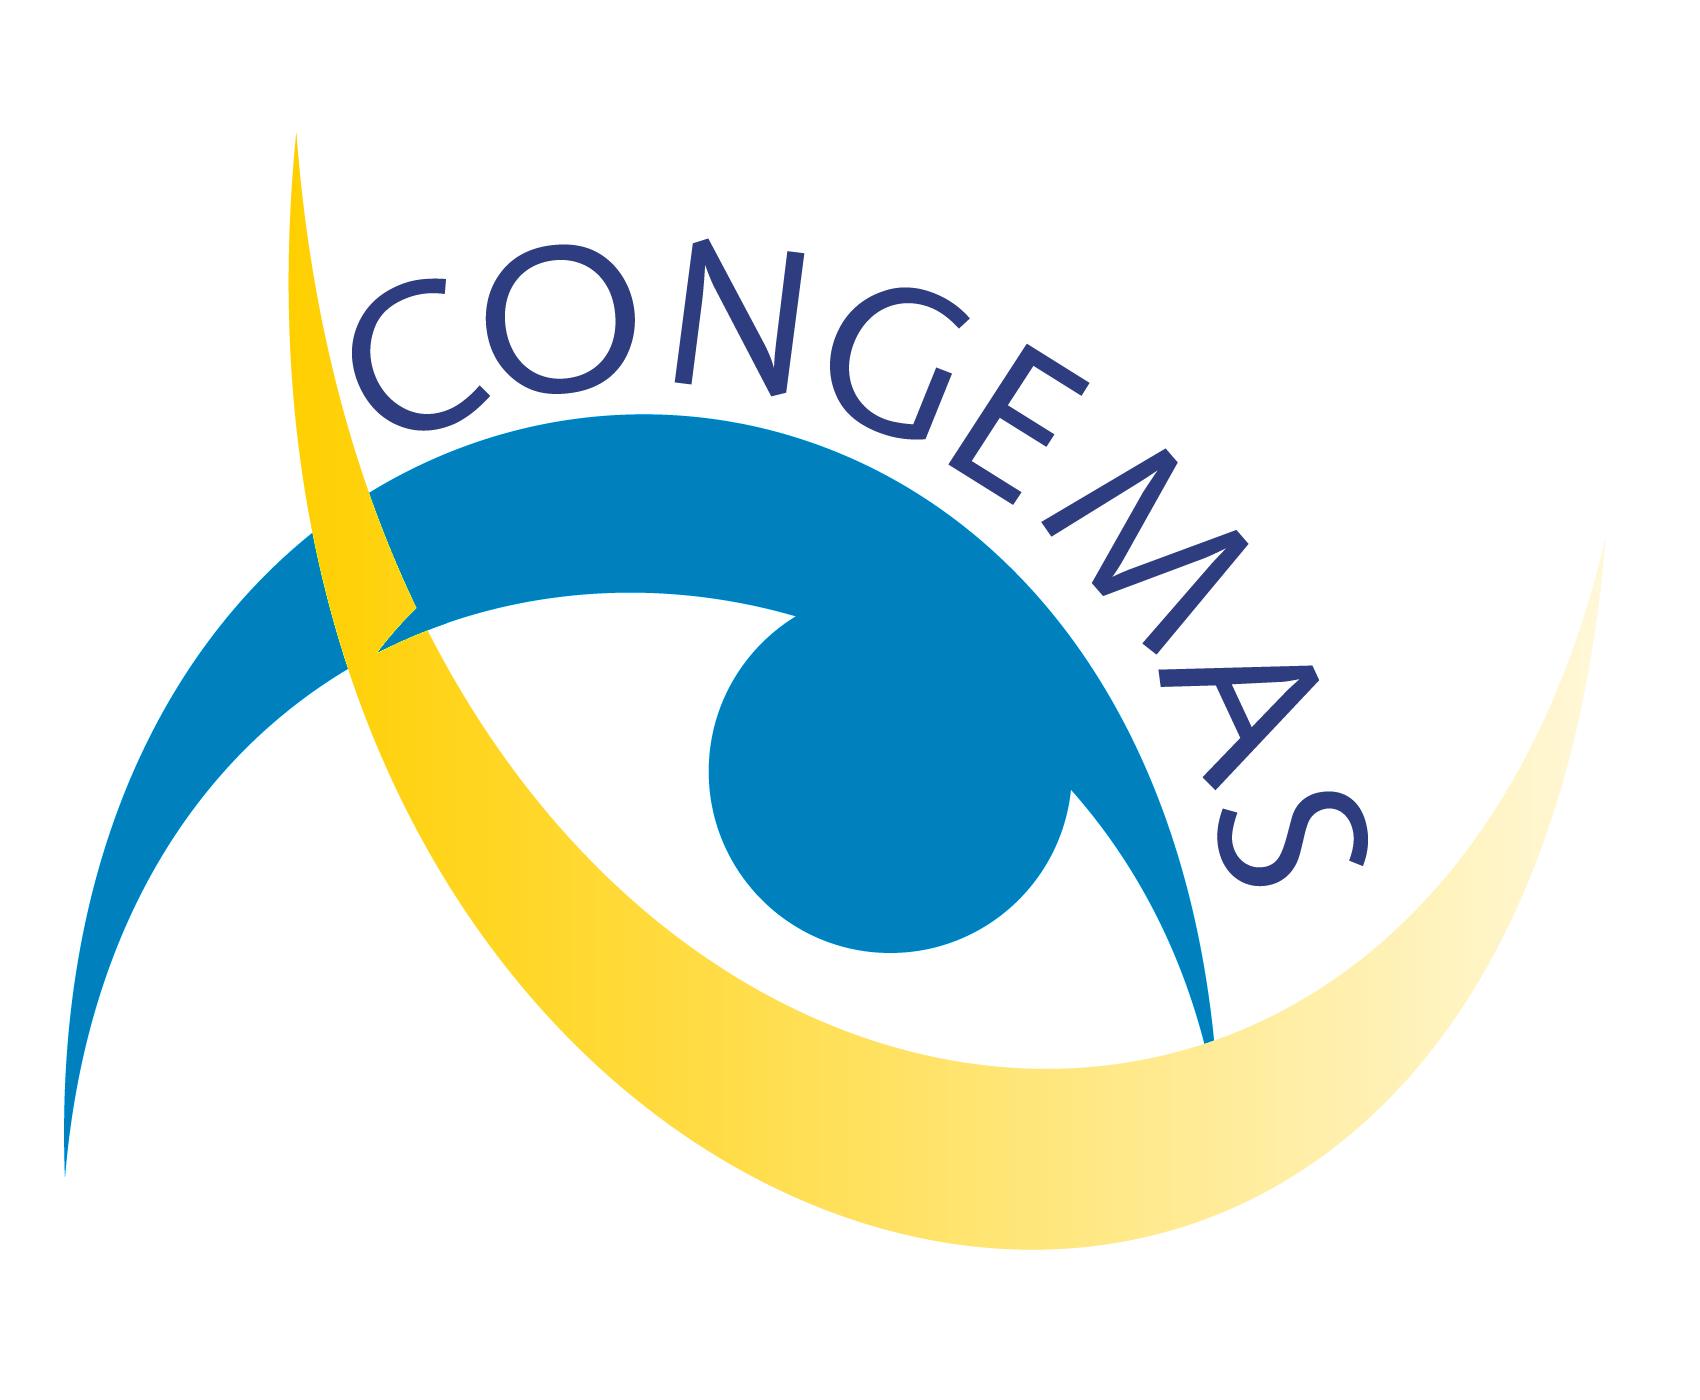 CONGEMAS - Encontro Nacional @ Belo Horizonte/MG